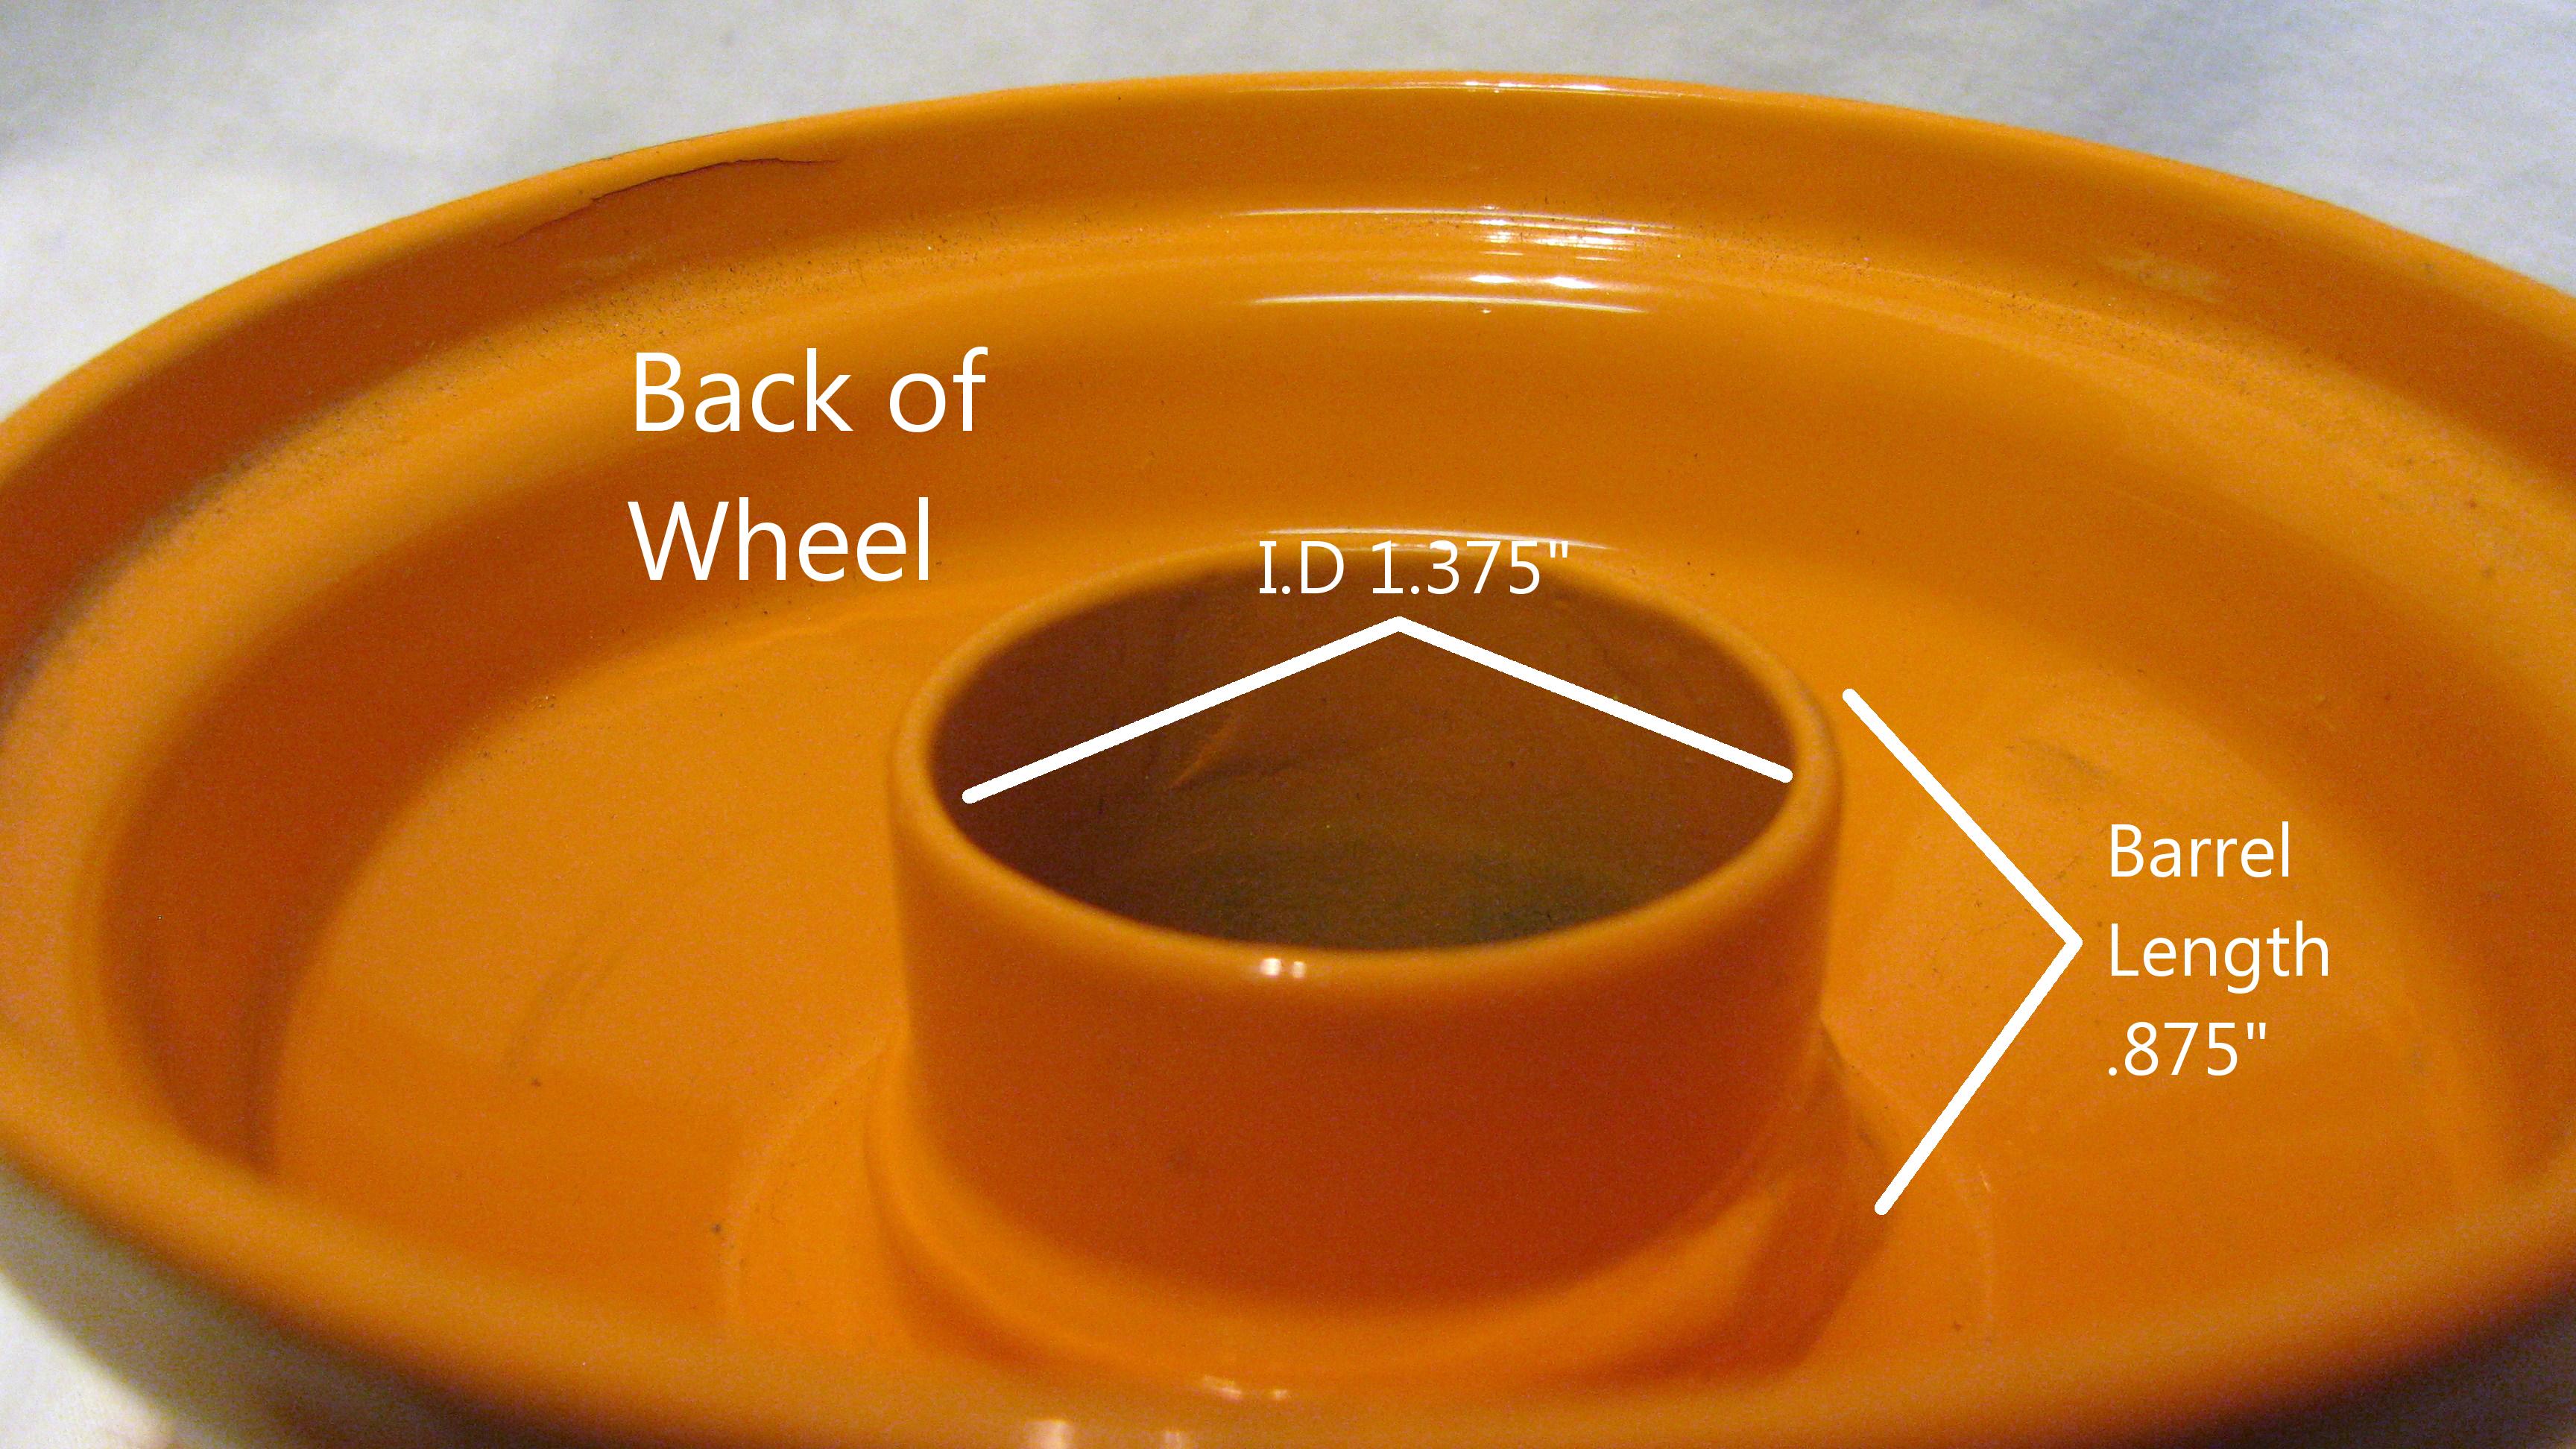 "4"" Rim Wheel for Husqvarna Zero Turn Riding Lawn Mower Deck or Implement 4x2 375"